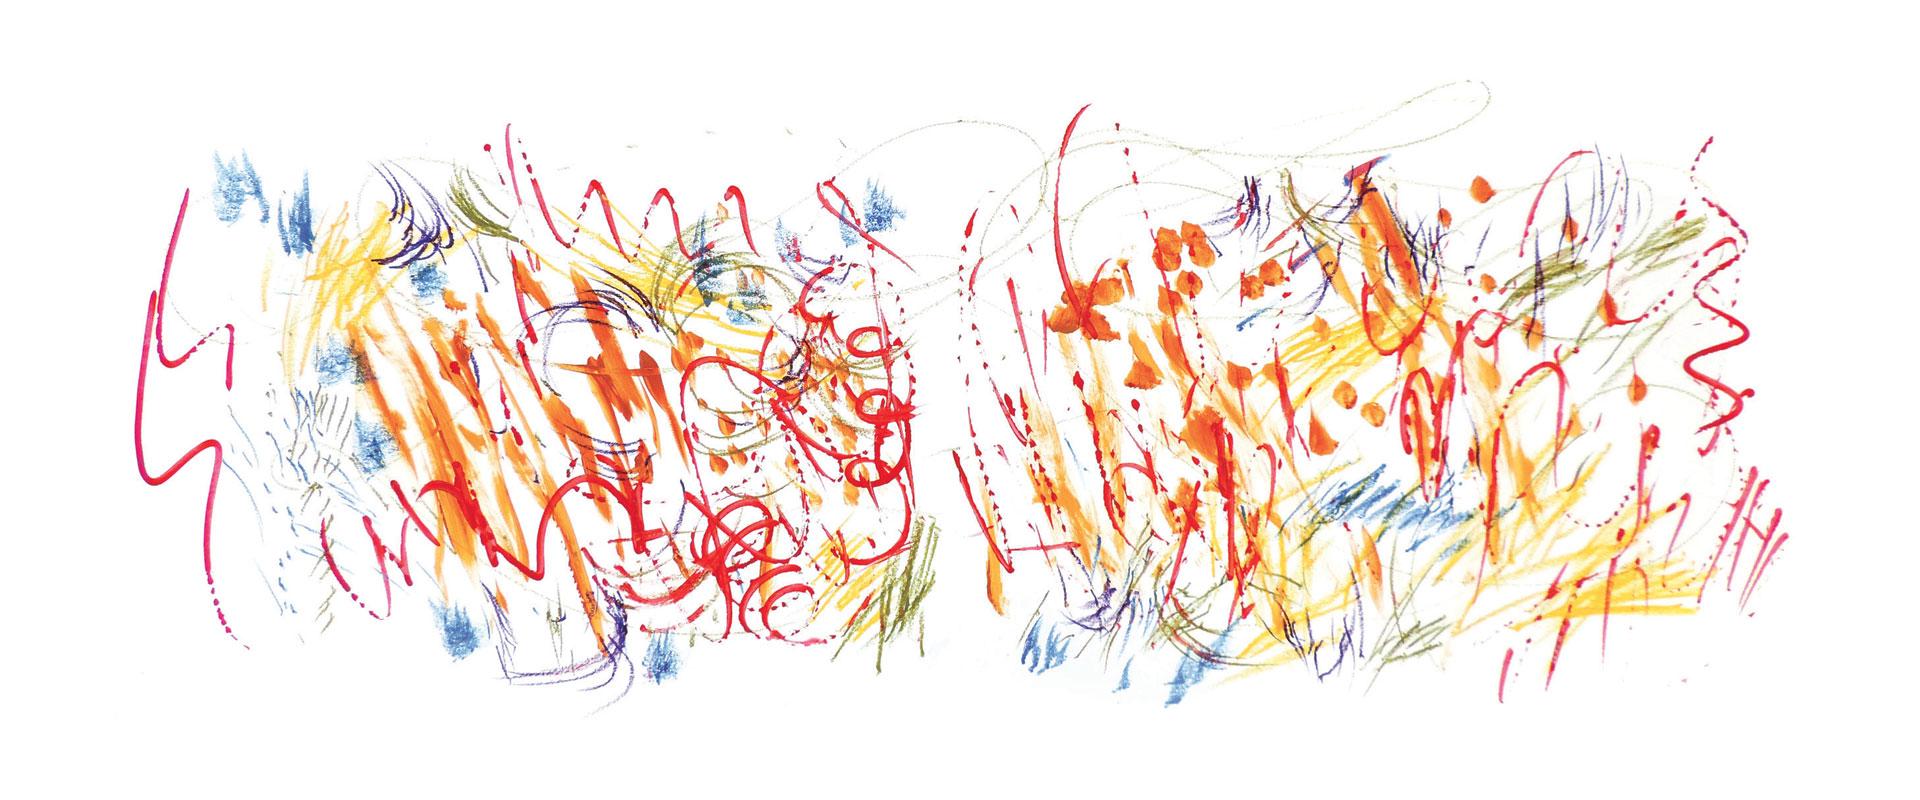 Samuel Taussat - Peinture intuitive